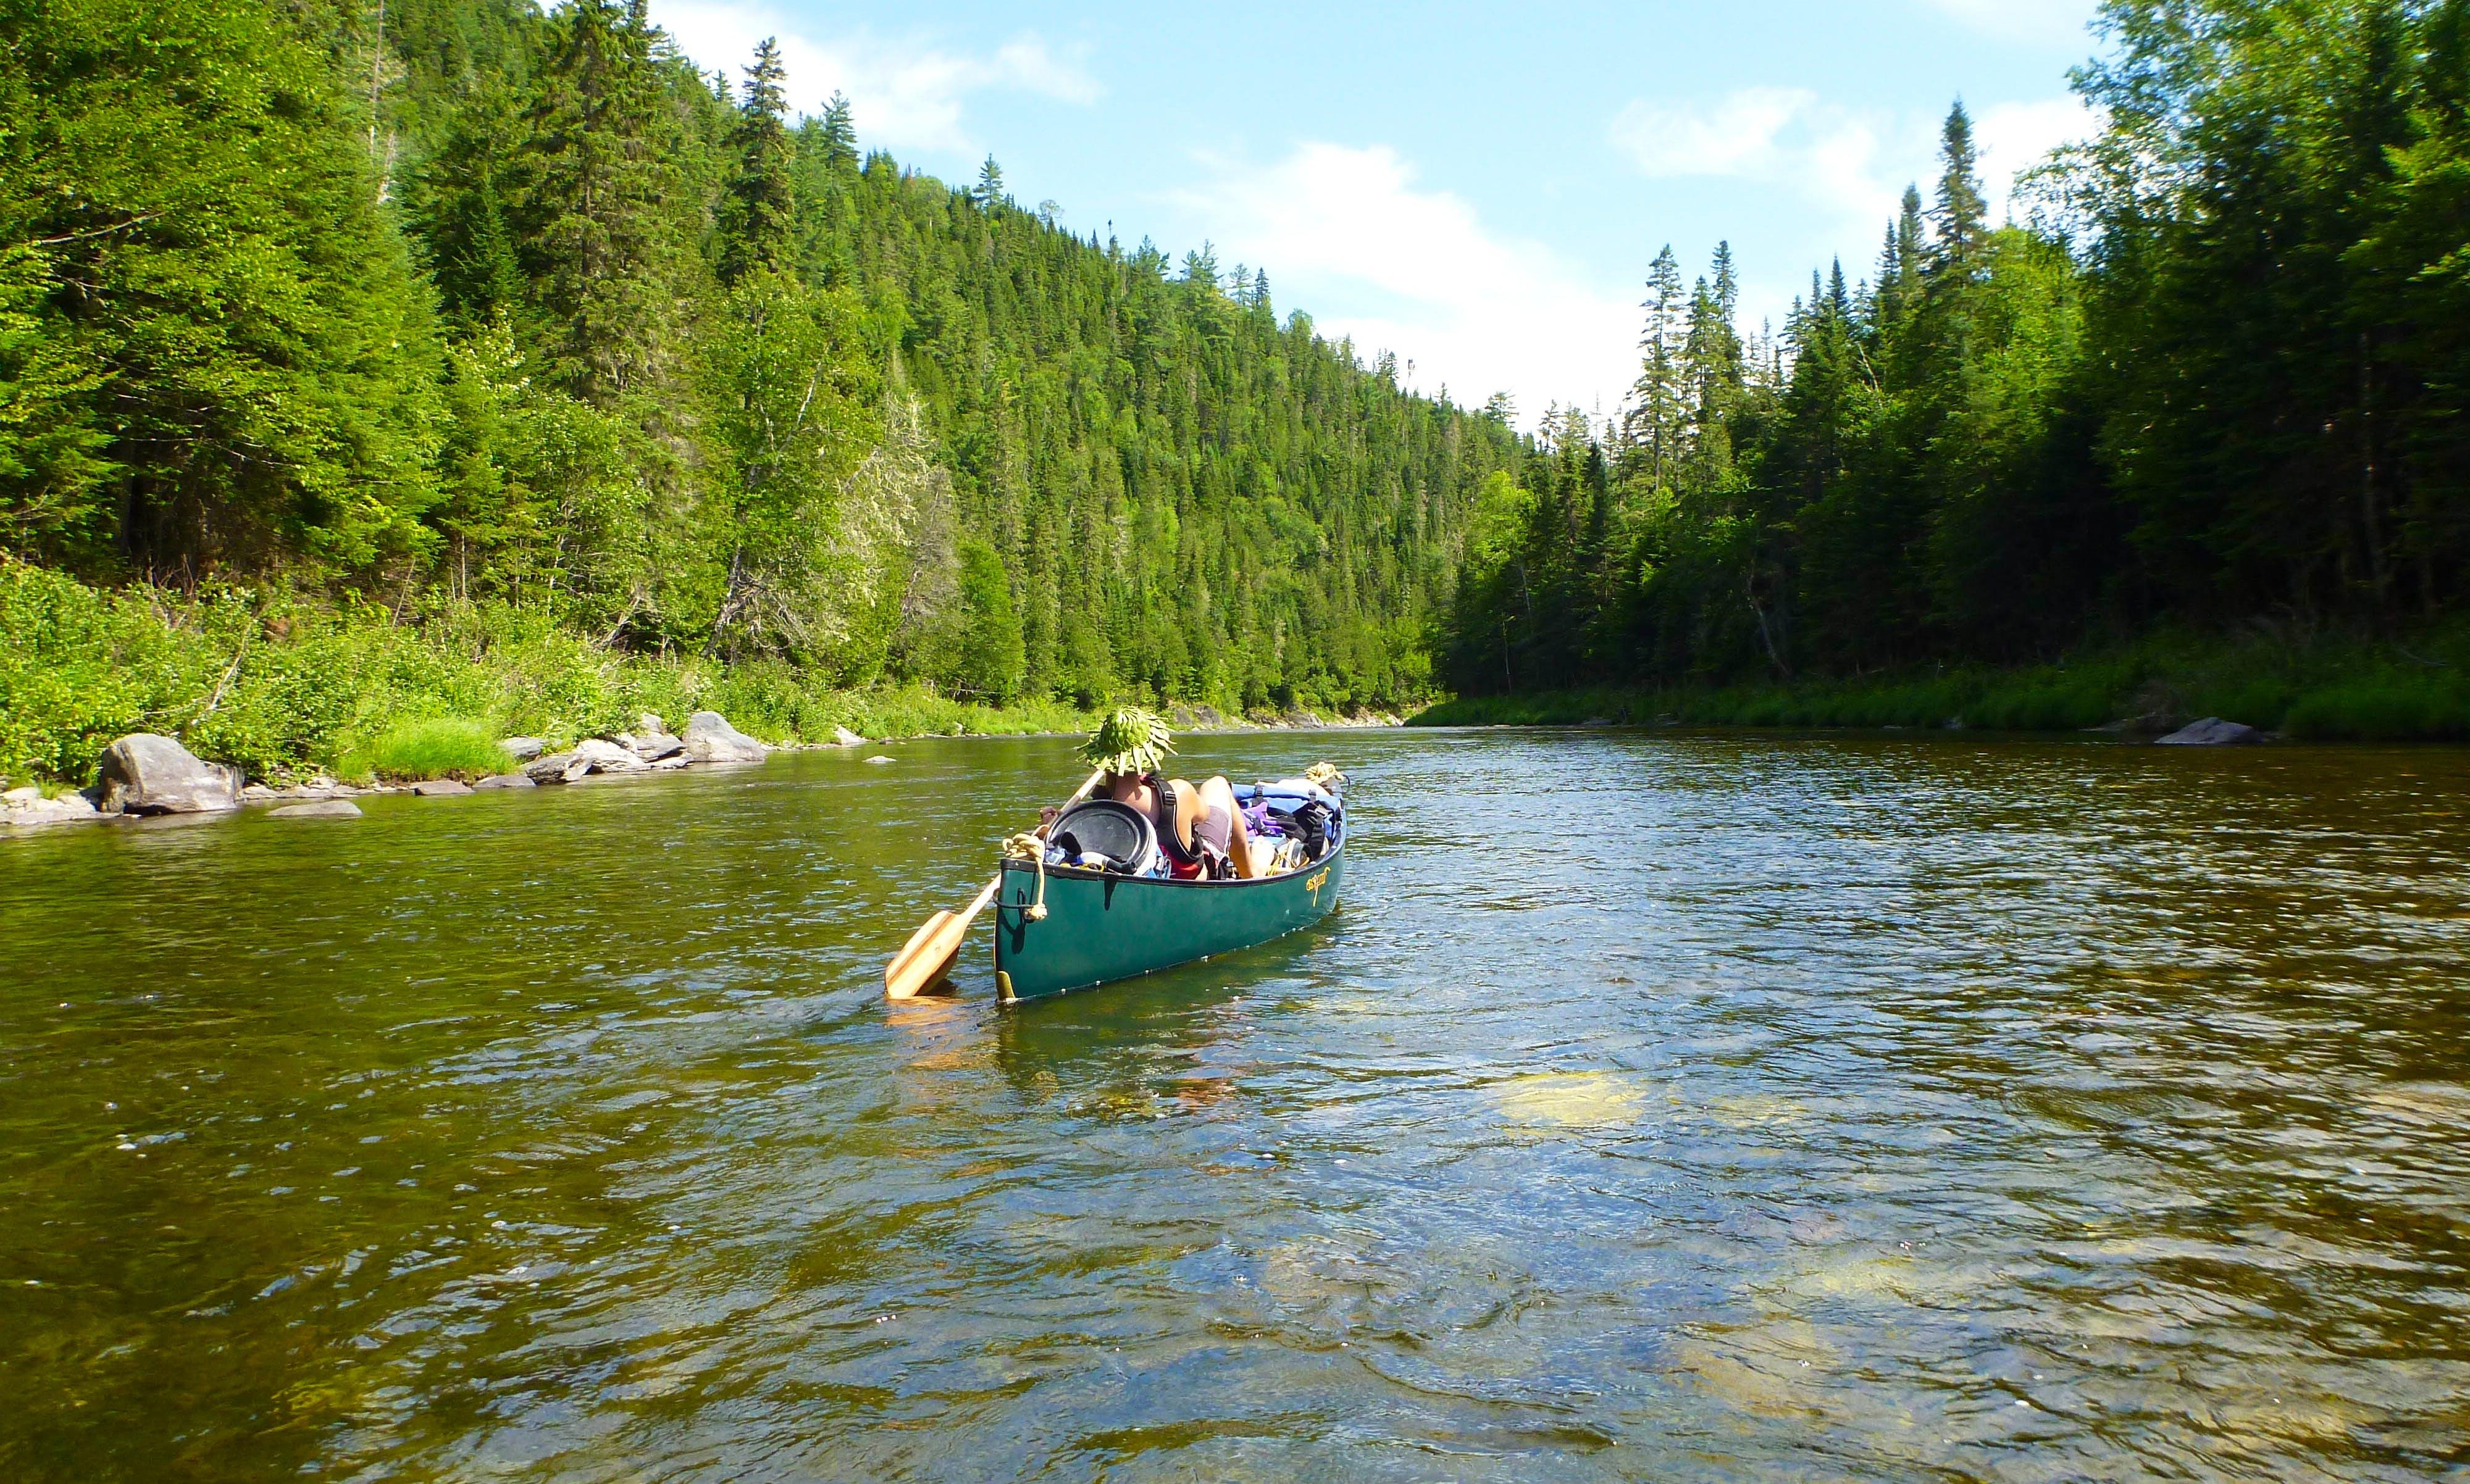 Canoe Rental & Guided Trips in Matapedia, Canada